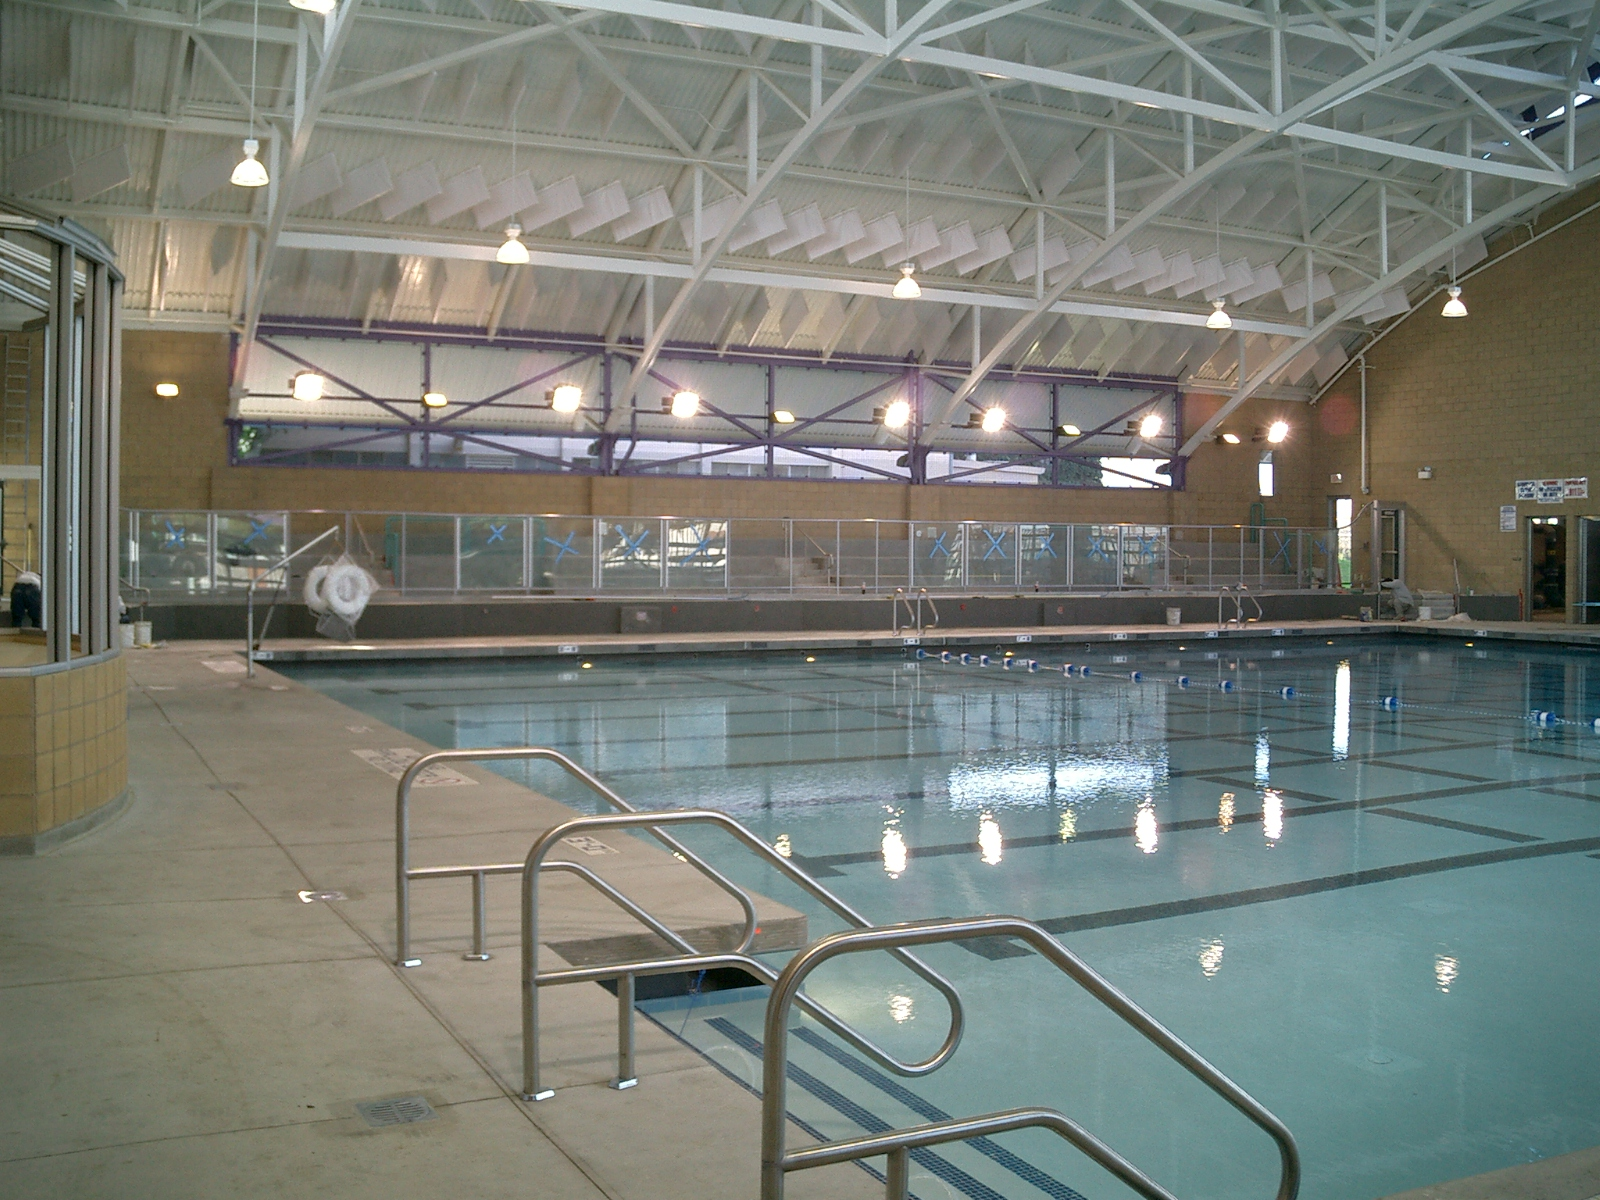 Jesse Owens Pool